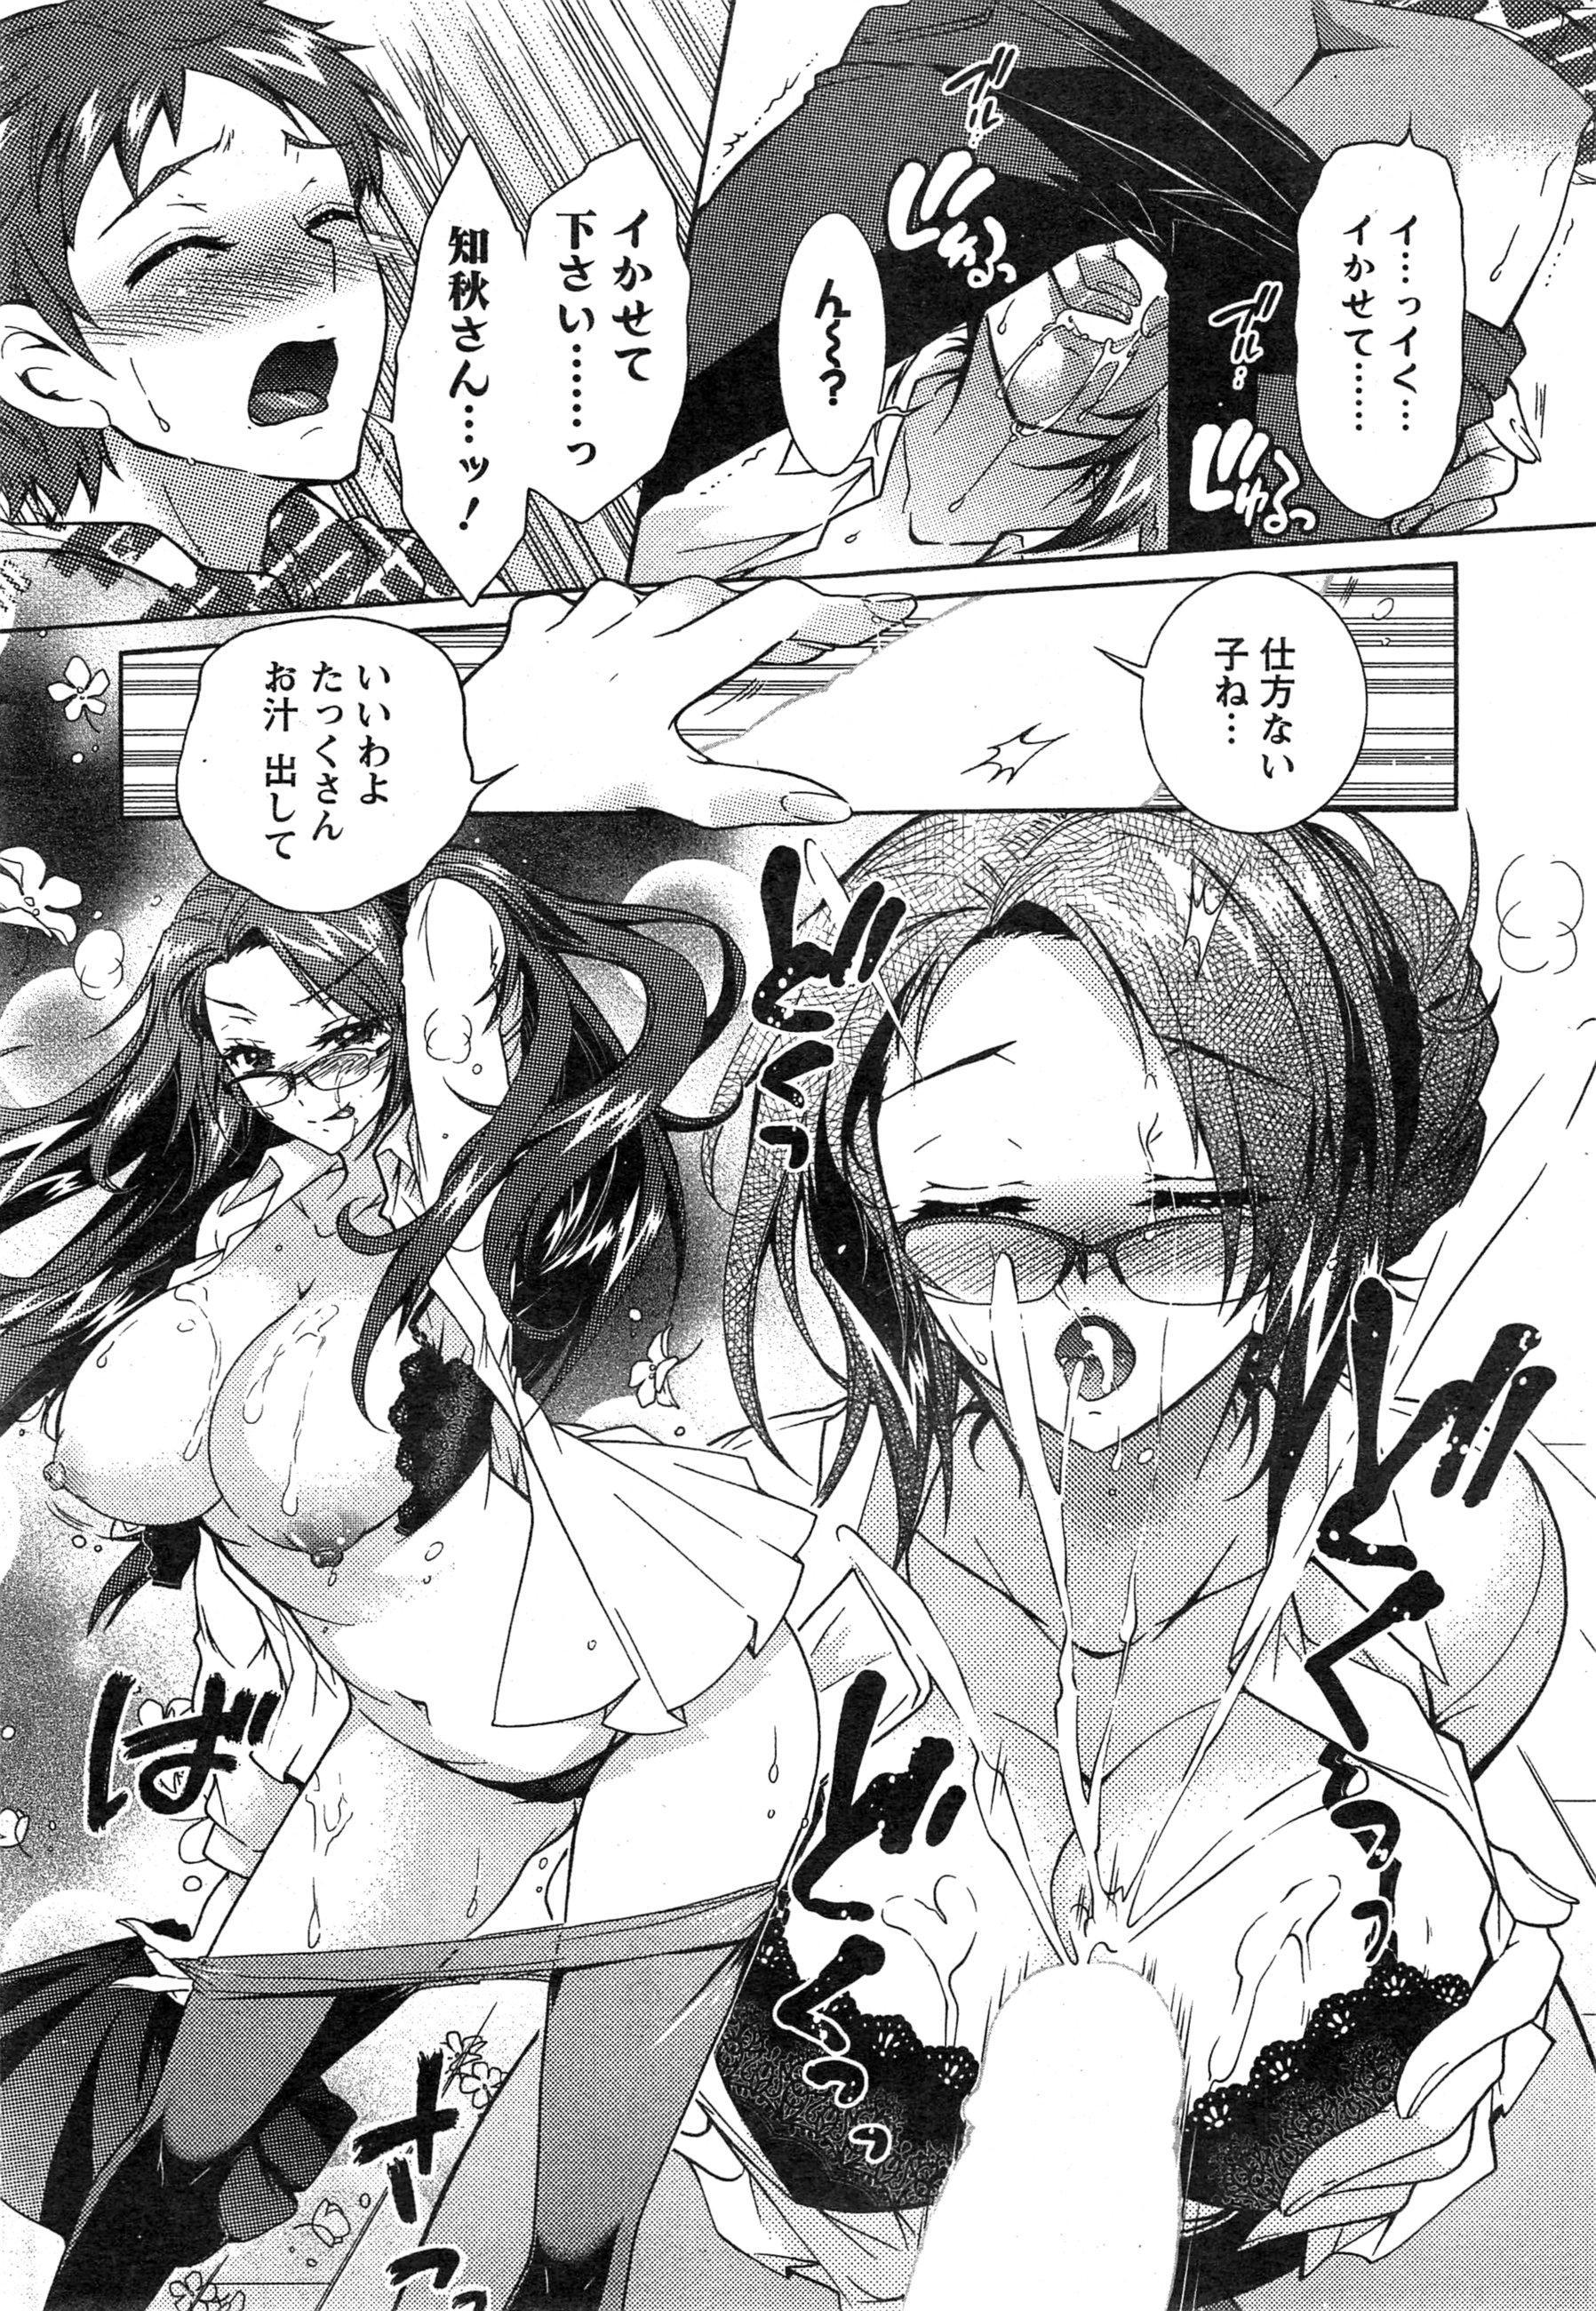 [Honda Arima] Sanshimai no Omocha - The Slave of Three Sisters Ch. 1-6 32